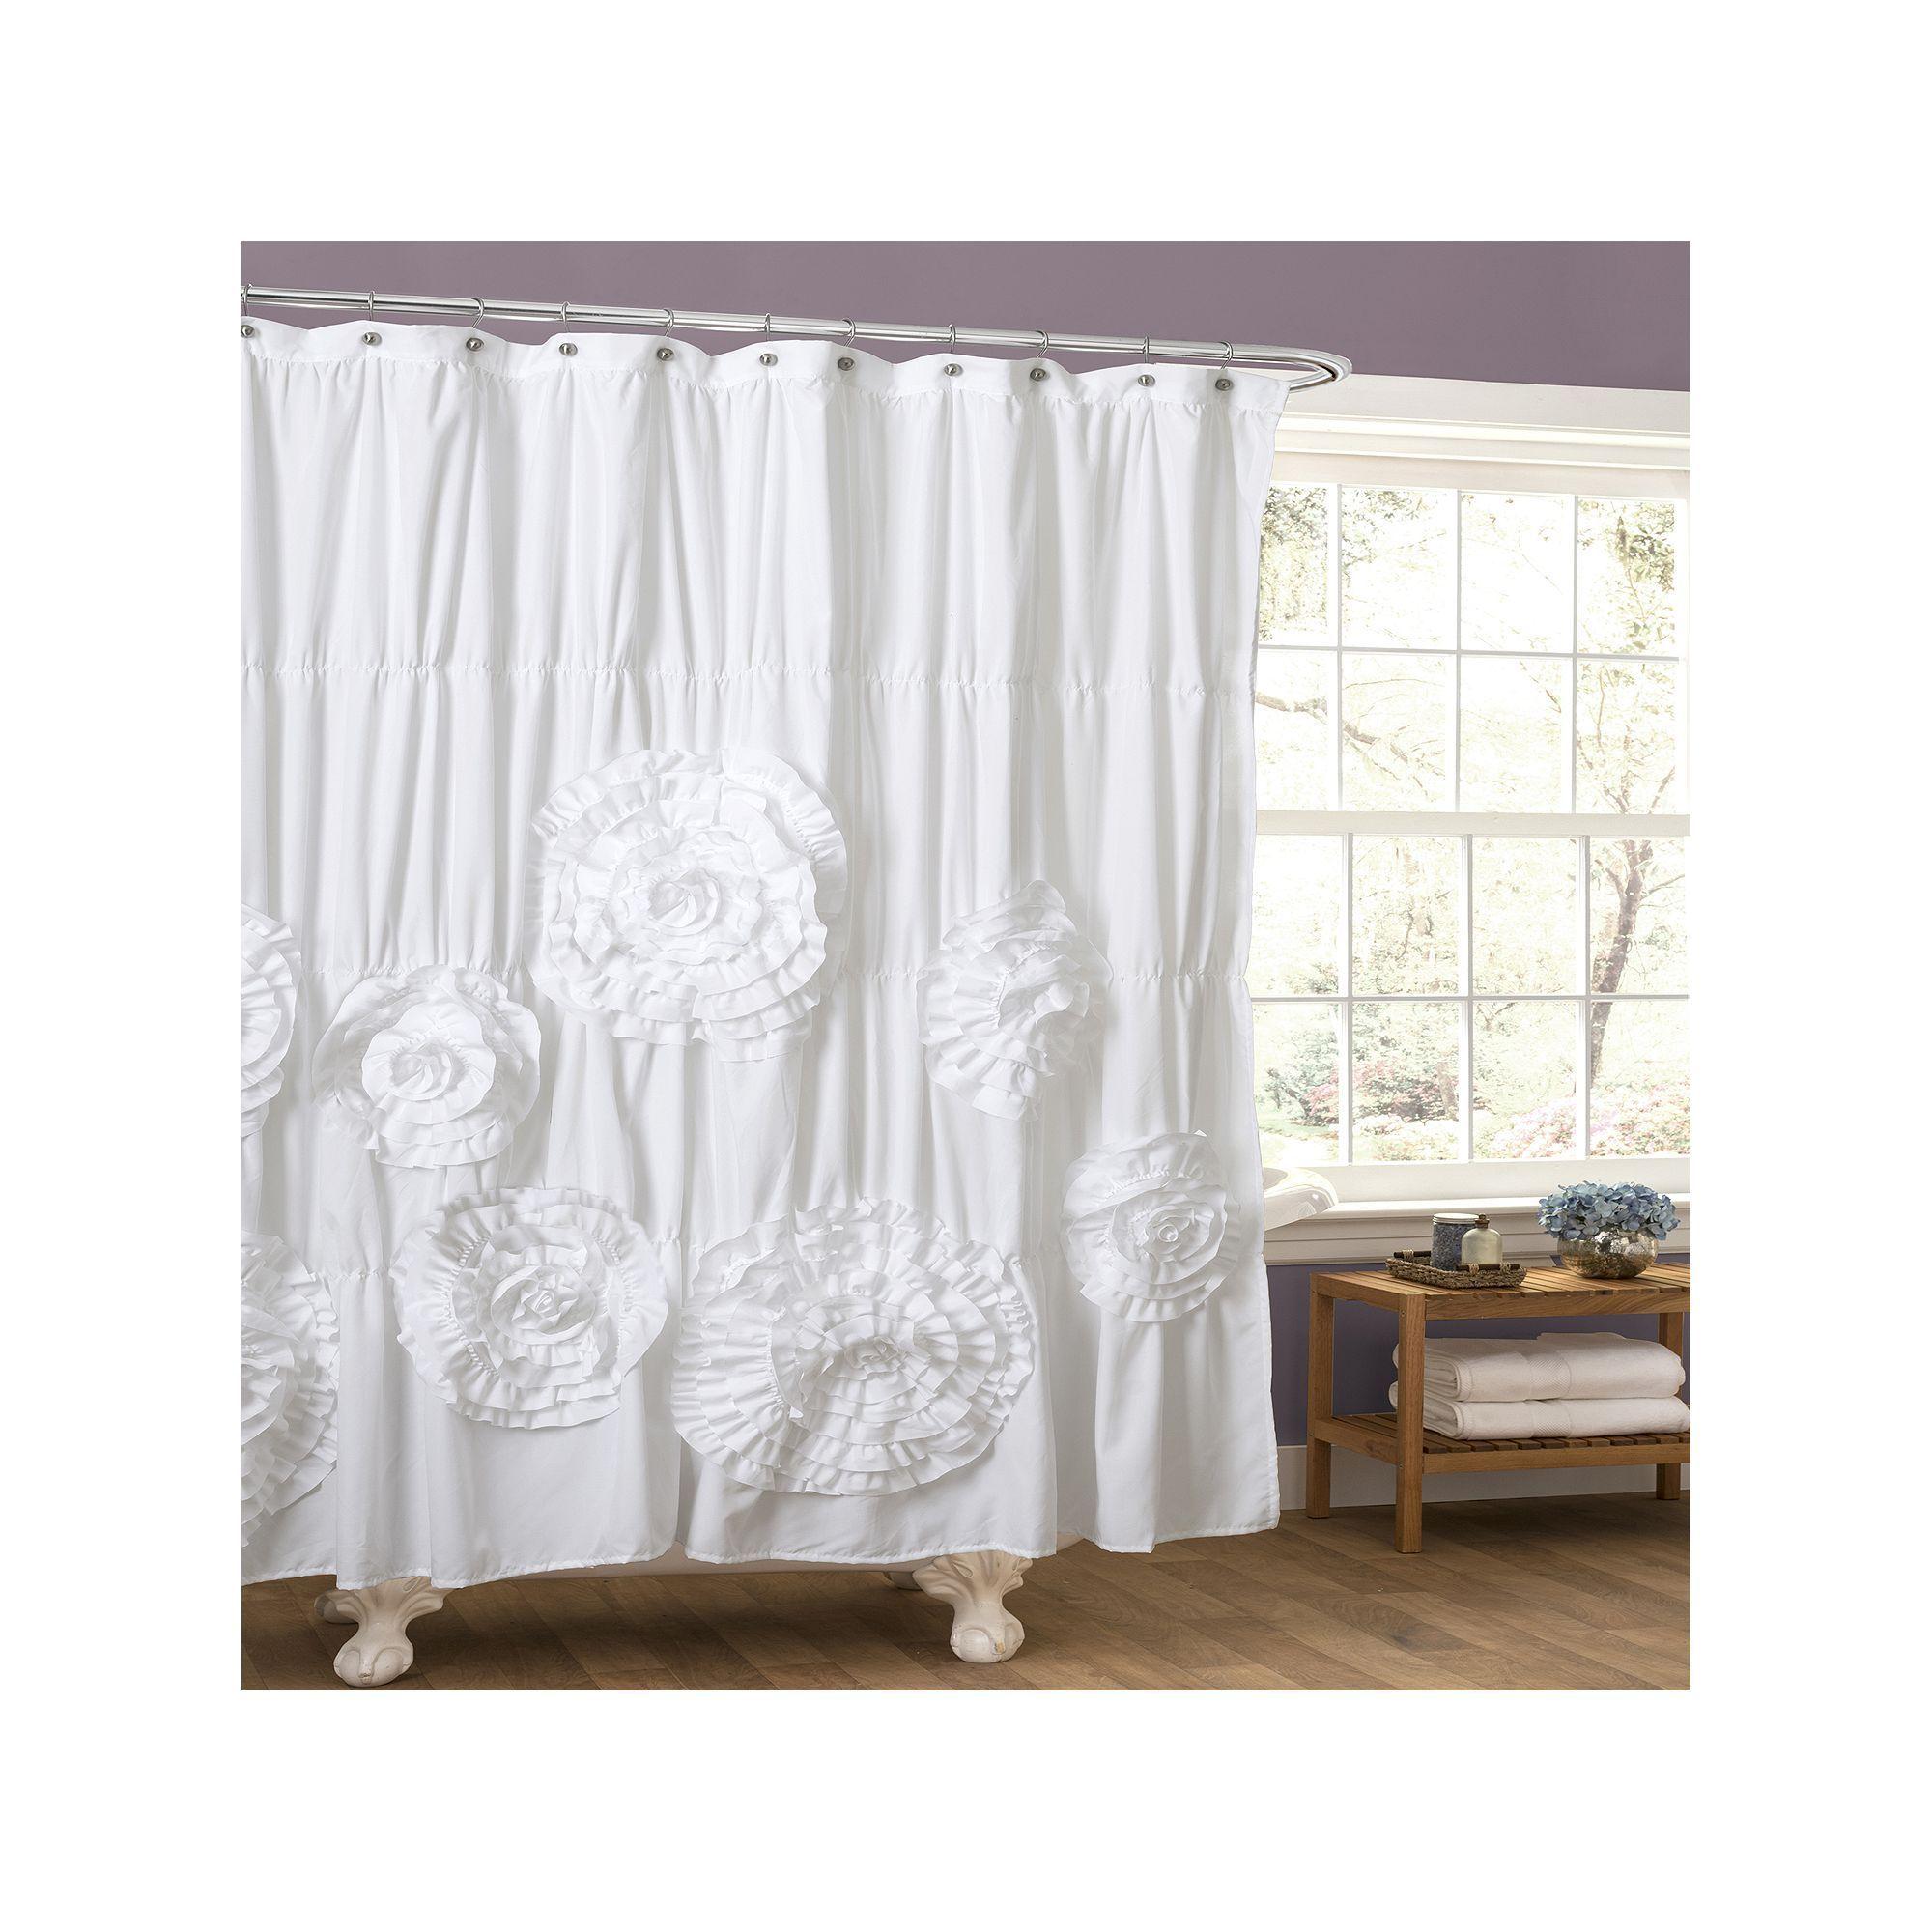 Lush Decor Serena Fabric Shower Curtain   LUSH, Fabrics and Bathroom ...